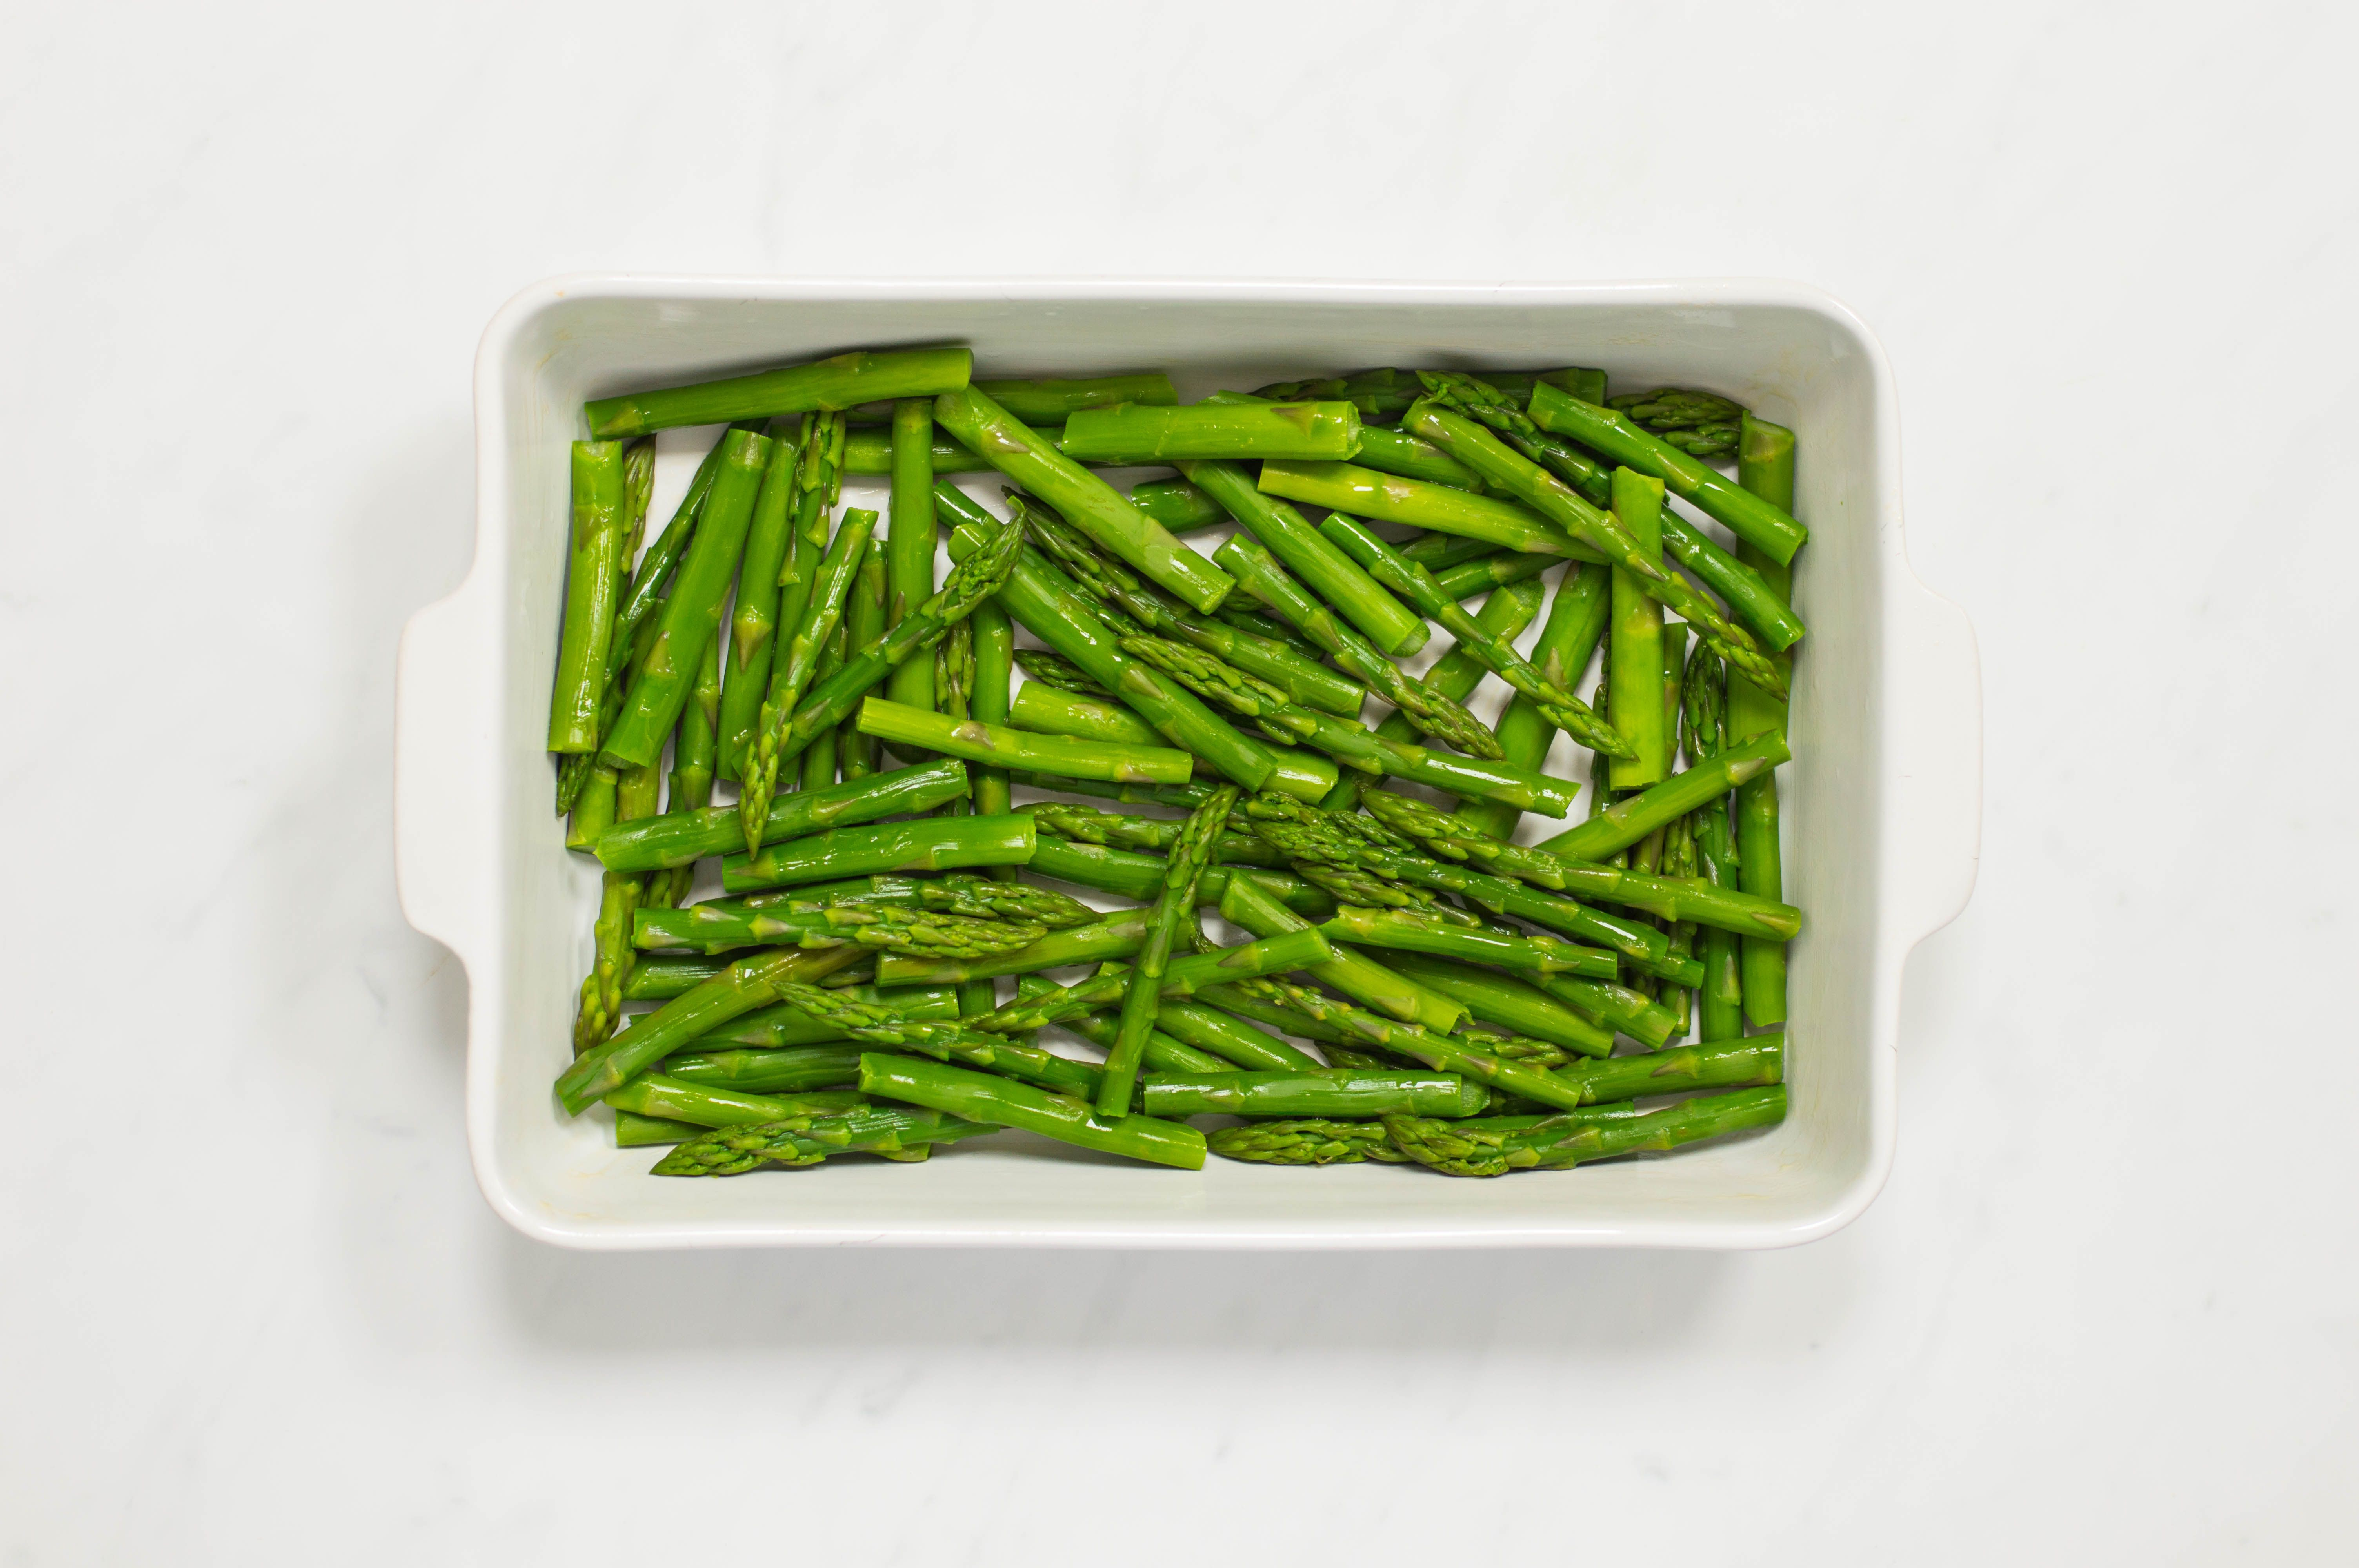 Scalloped Asparagus Casserole recipe